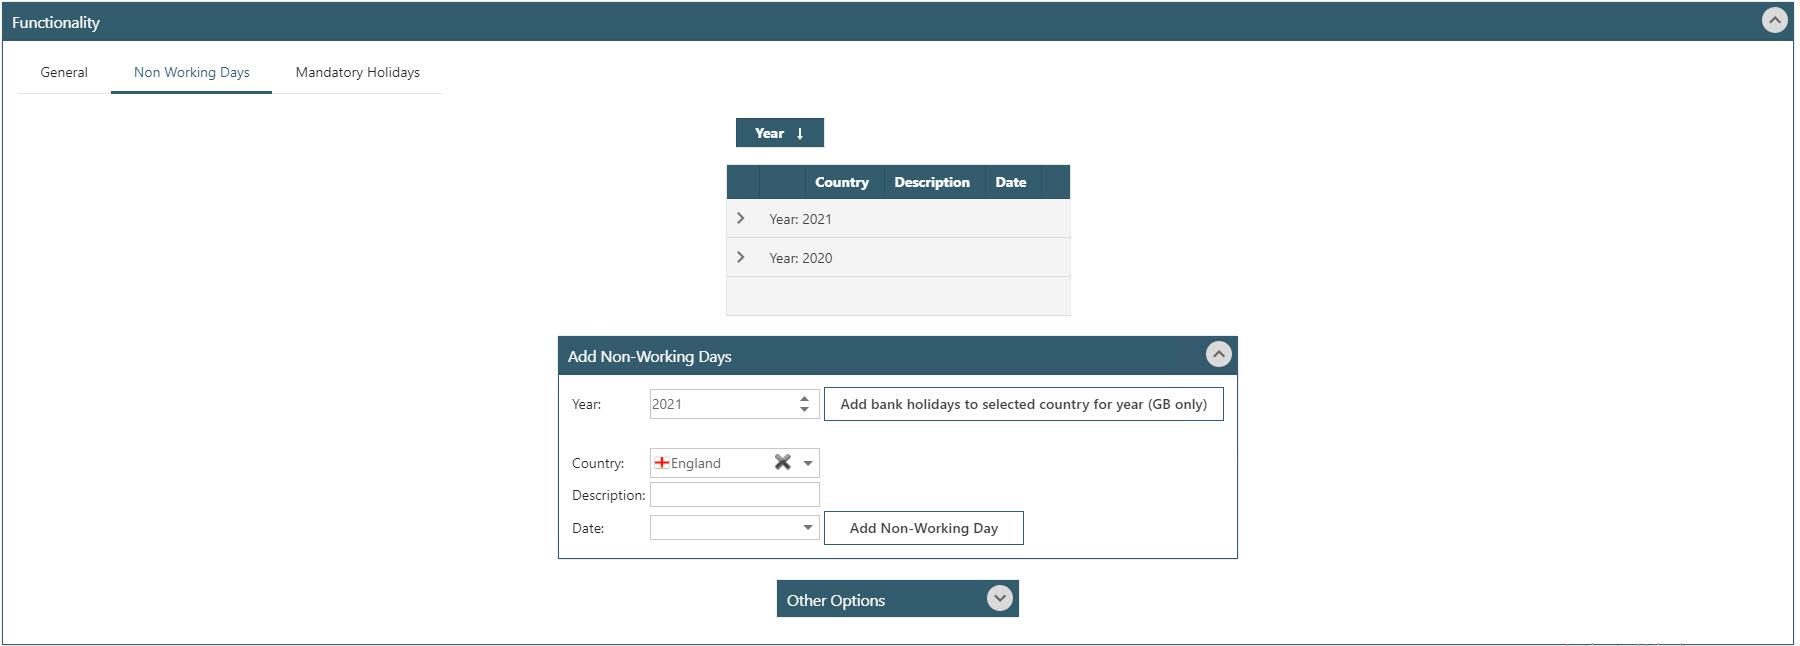 Sicon WAP Holidays Help and User Guide - WAP Holidays HUG Section 3.2 - Image 1